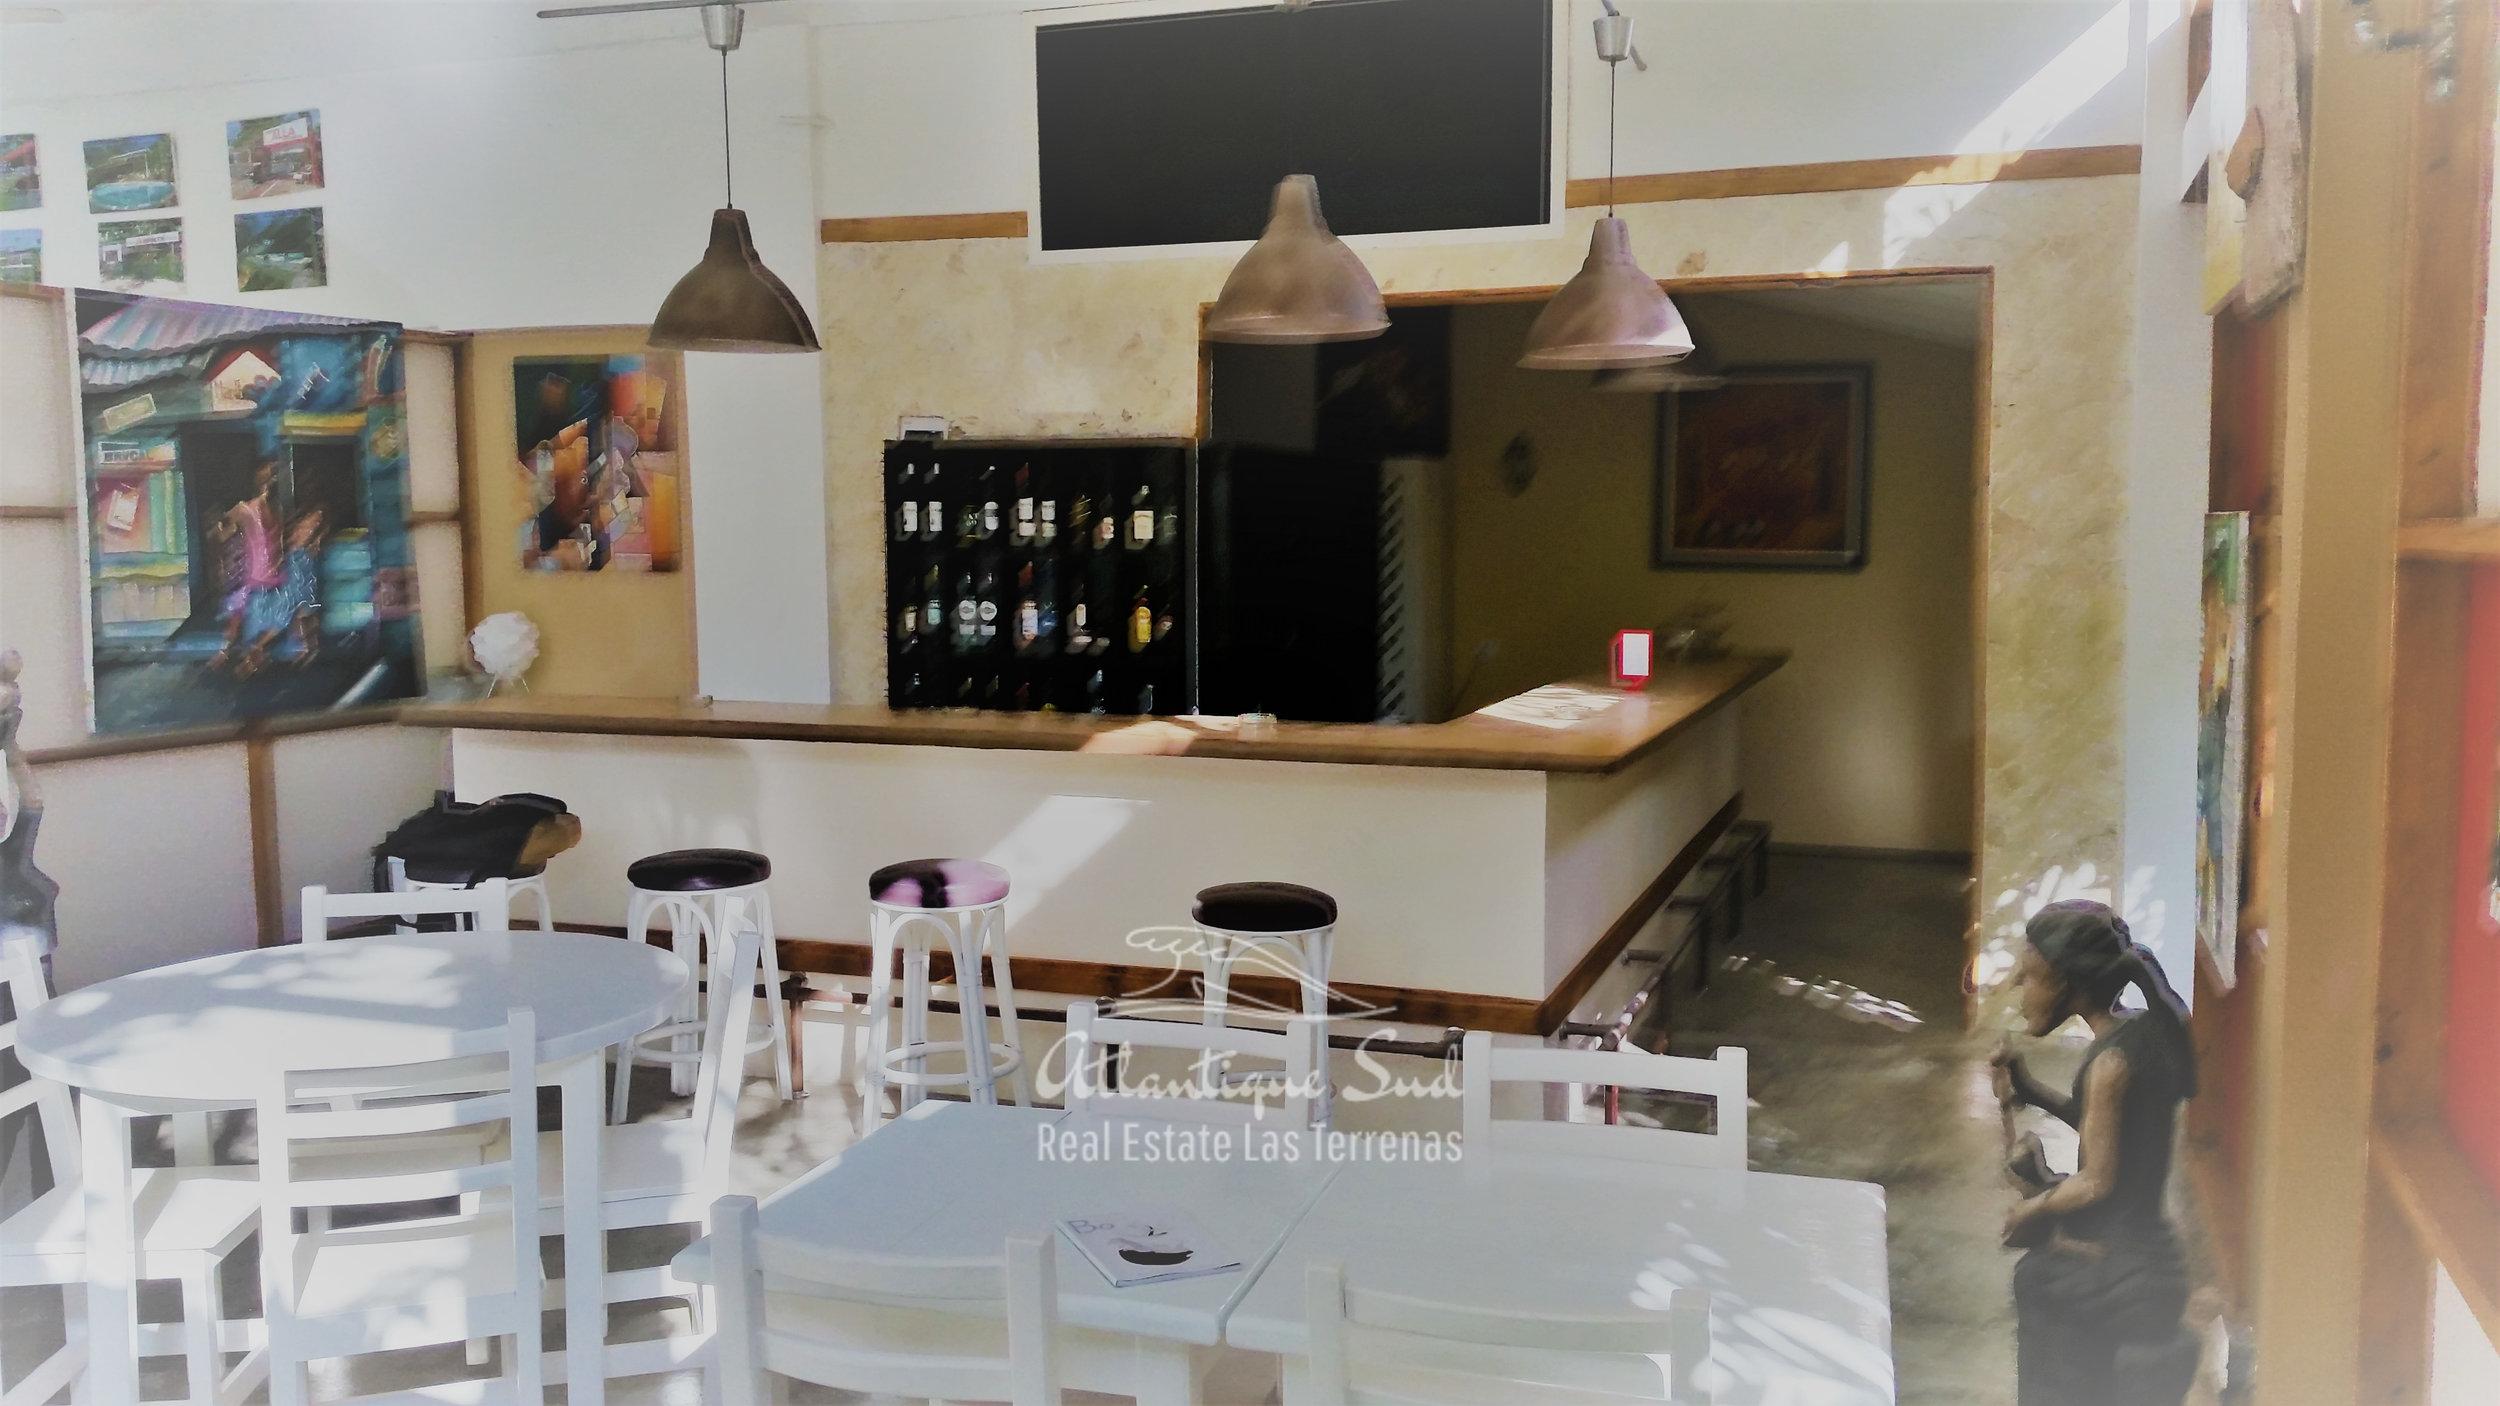 Small hotel for sale next to the beach Real Estate Las Terrenas Atlantique Sud Dominican Republic18.jpg